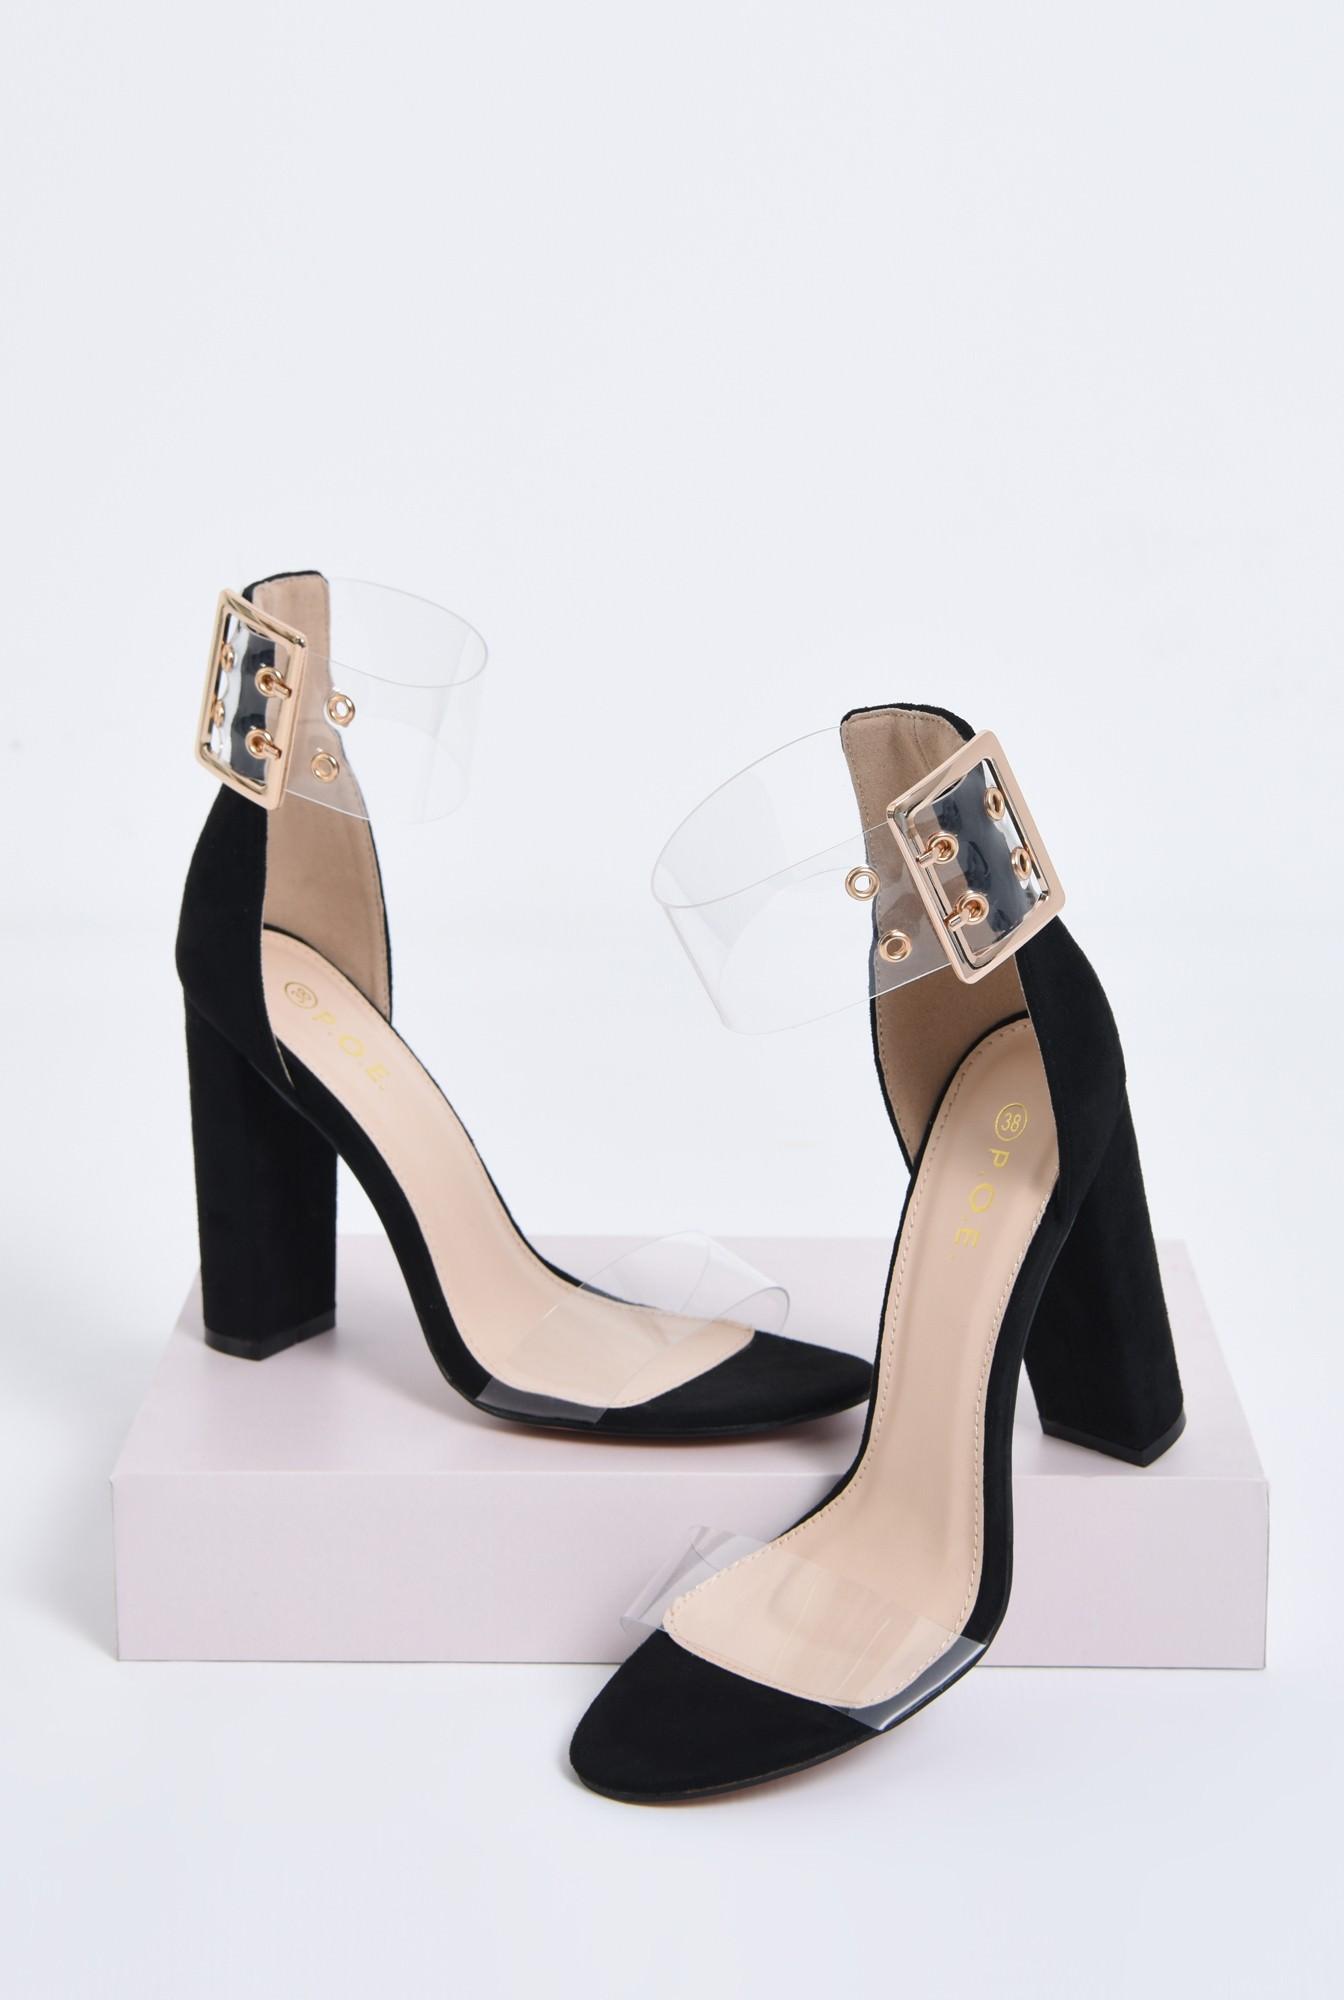 2 - sandale dama, toc gros, capse, auriu